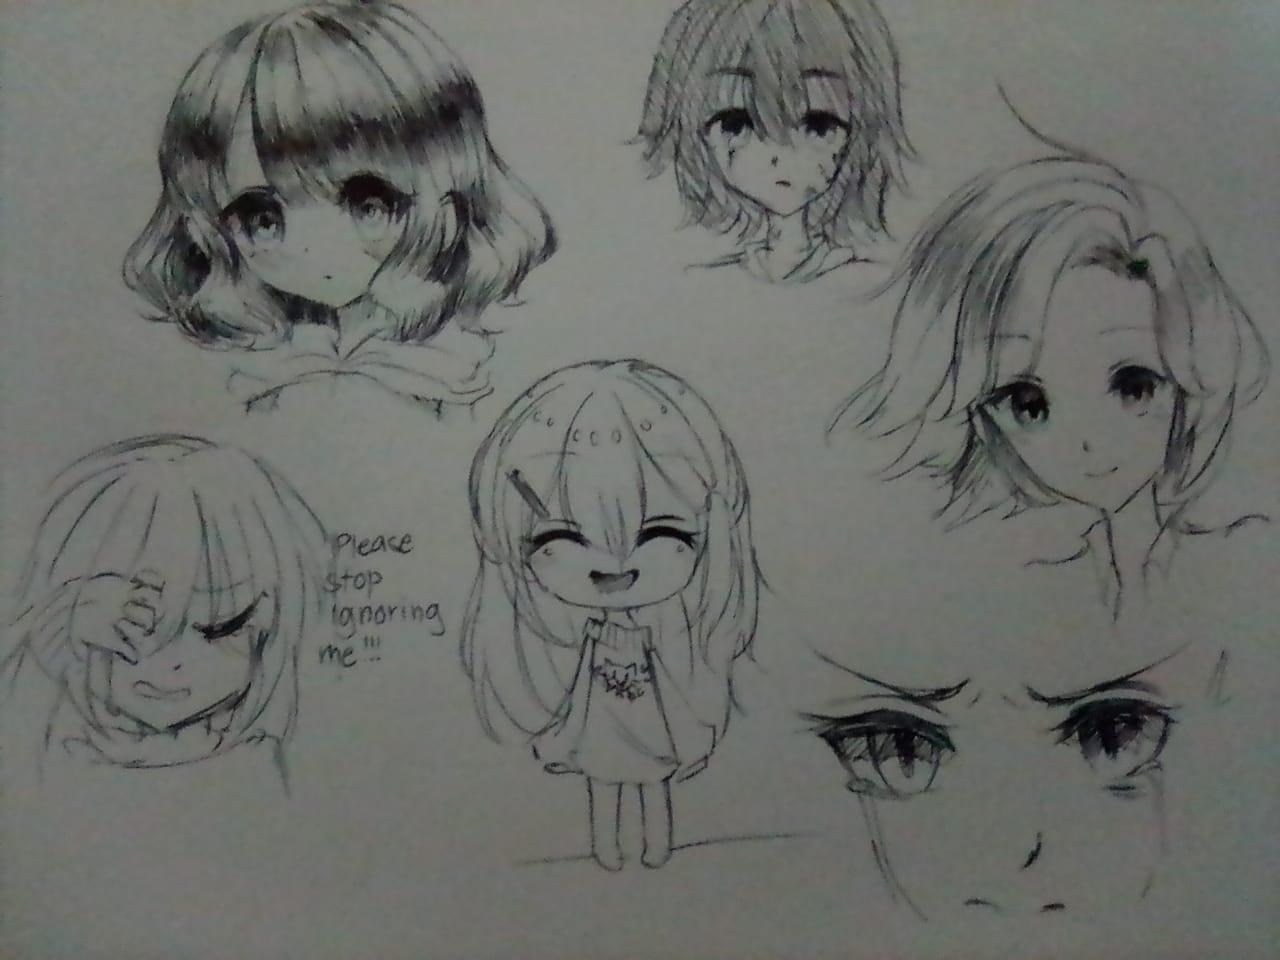 Sketches Illust of Izayoi Mikasa oc girl Mii-chan(Mikasa) Pen ink sketch IzayoiMikasa kawaii